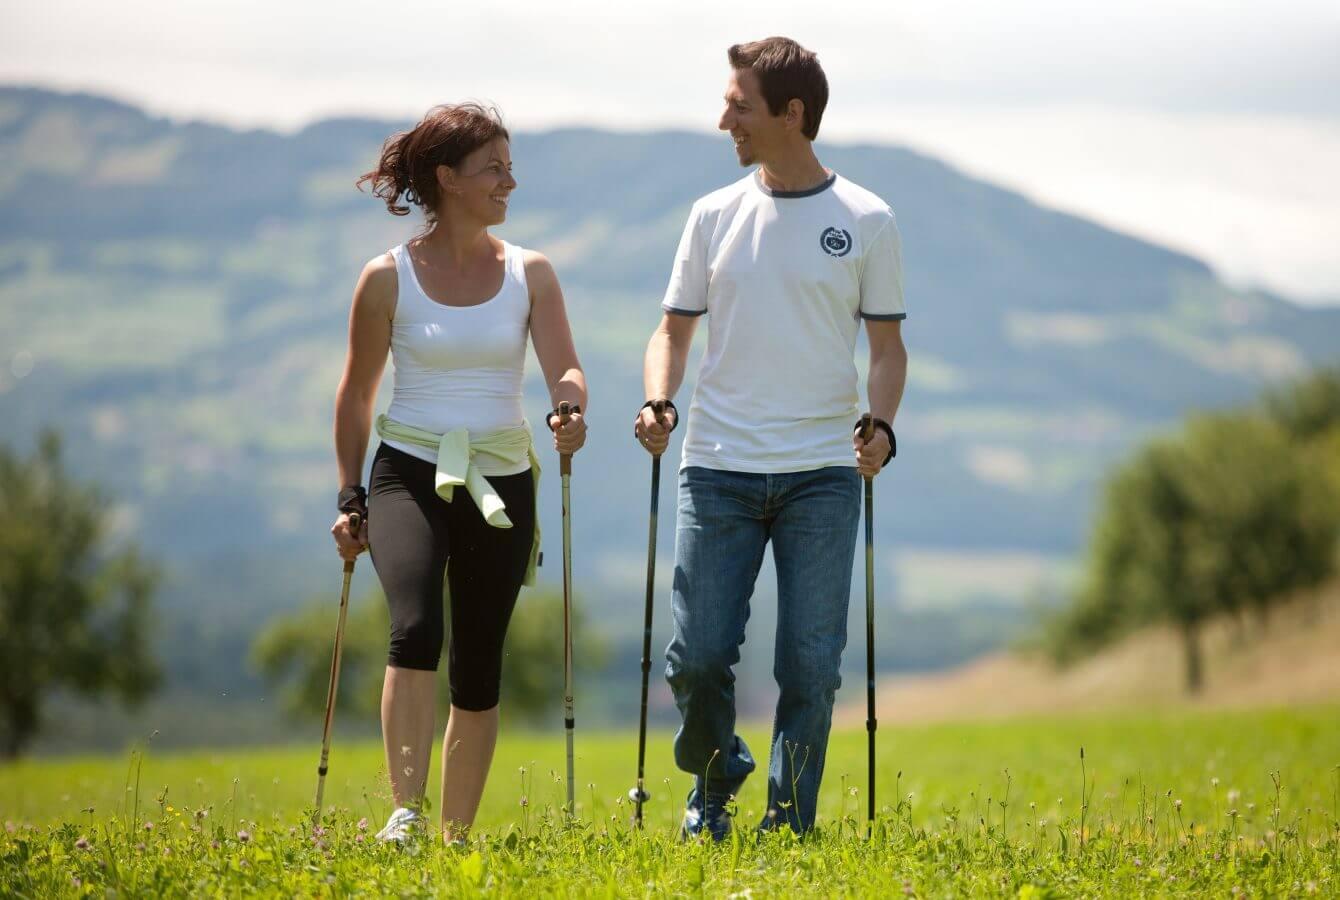 Walkingstrecken neben dem Wanderhotel in der Steiermark - Ballonhotel Thaller